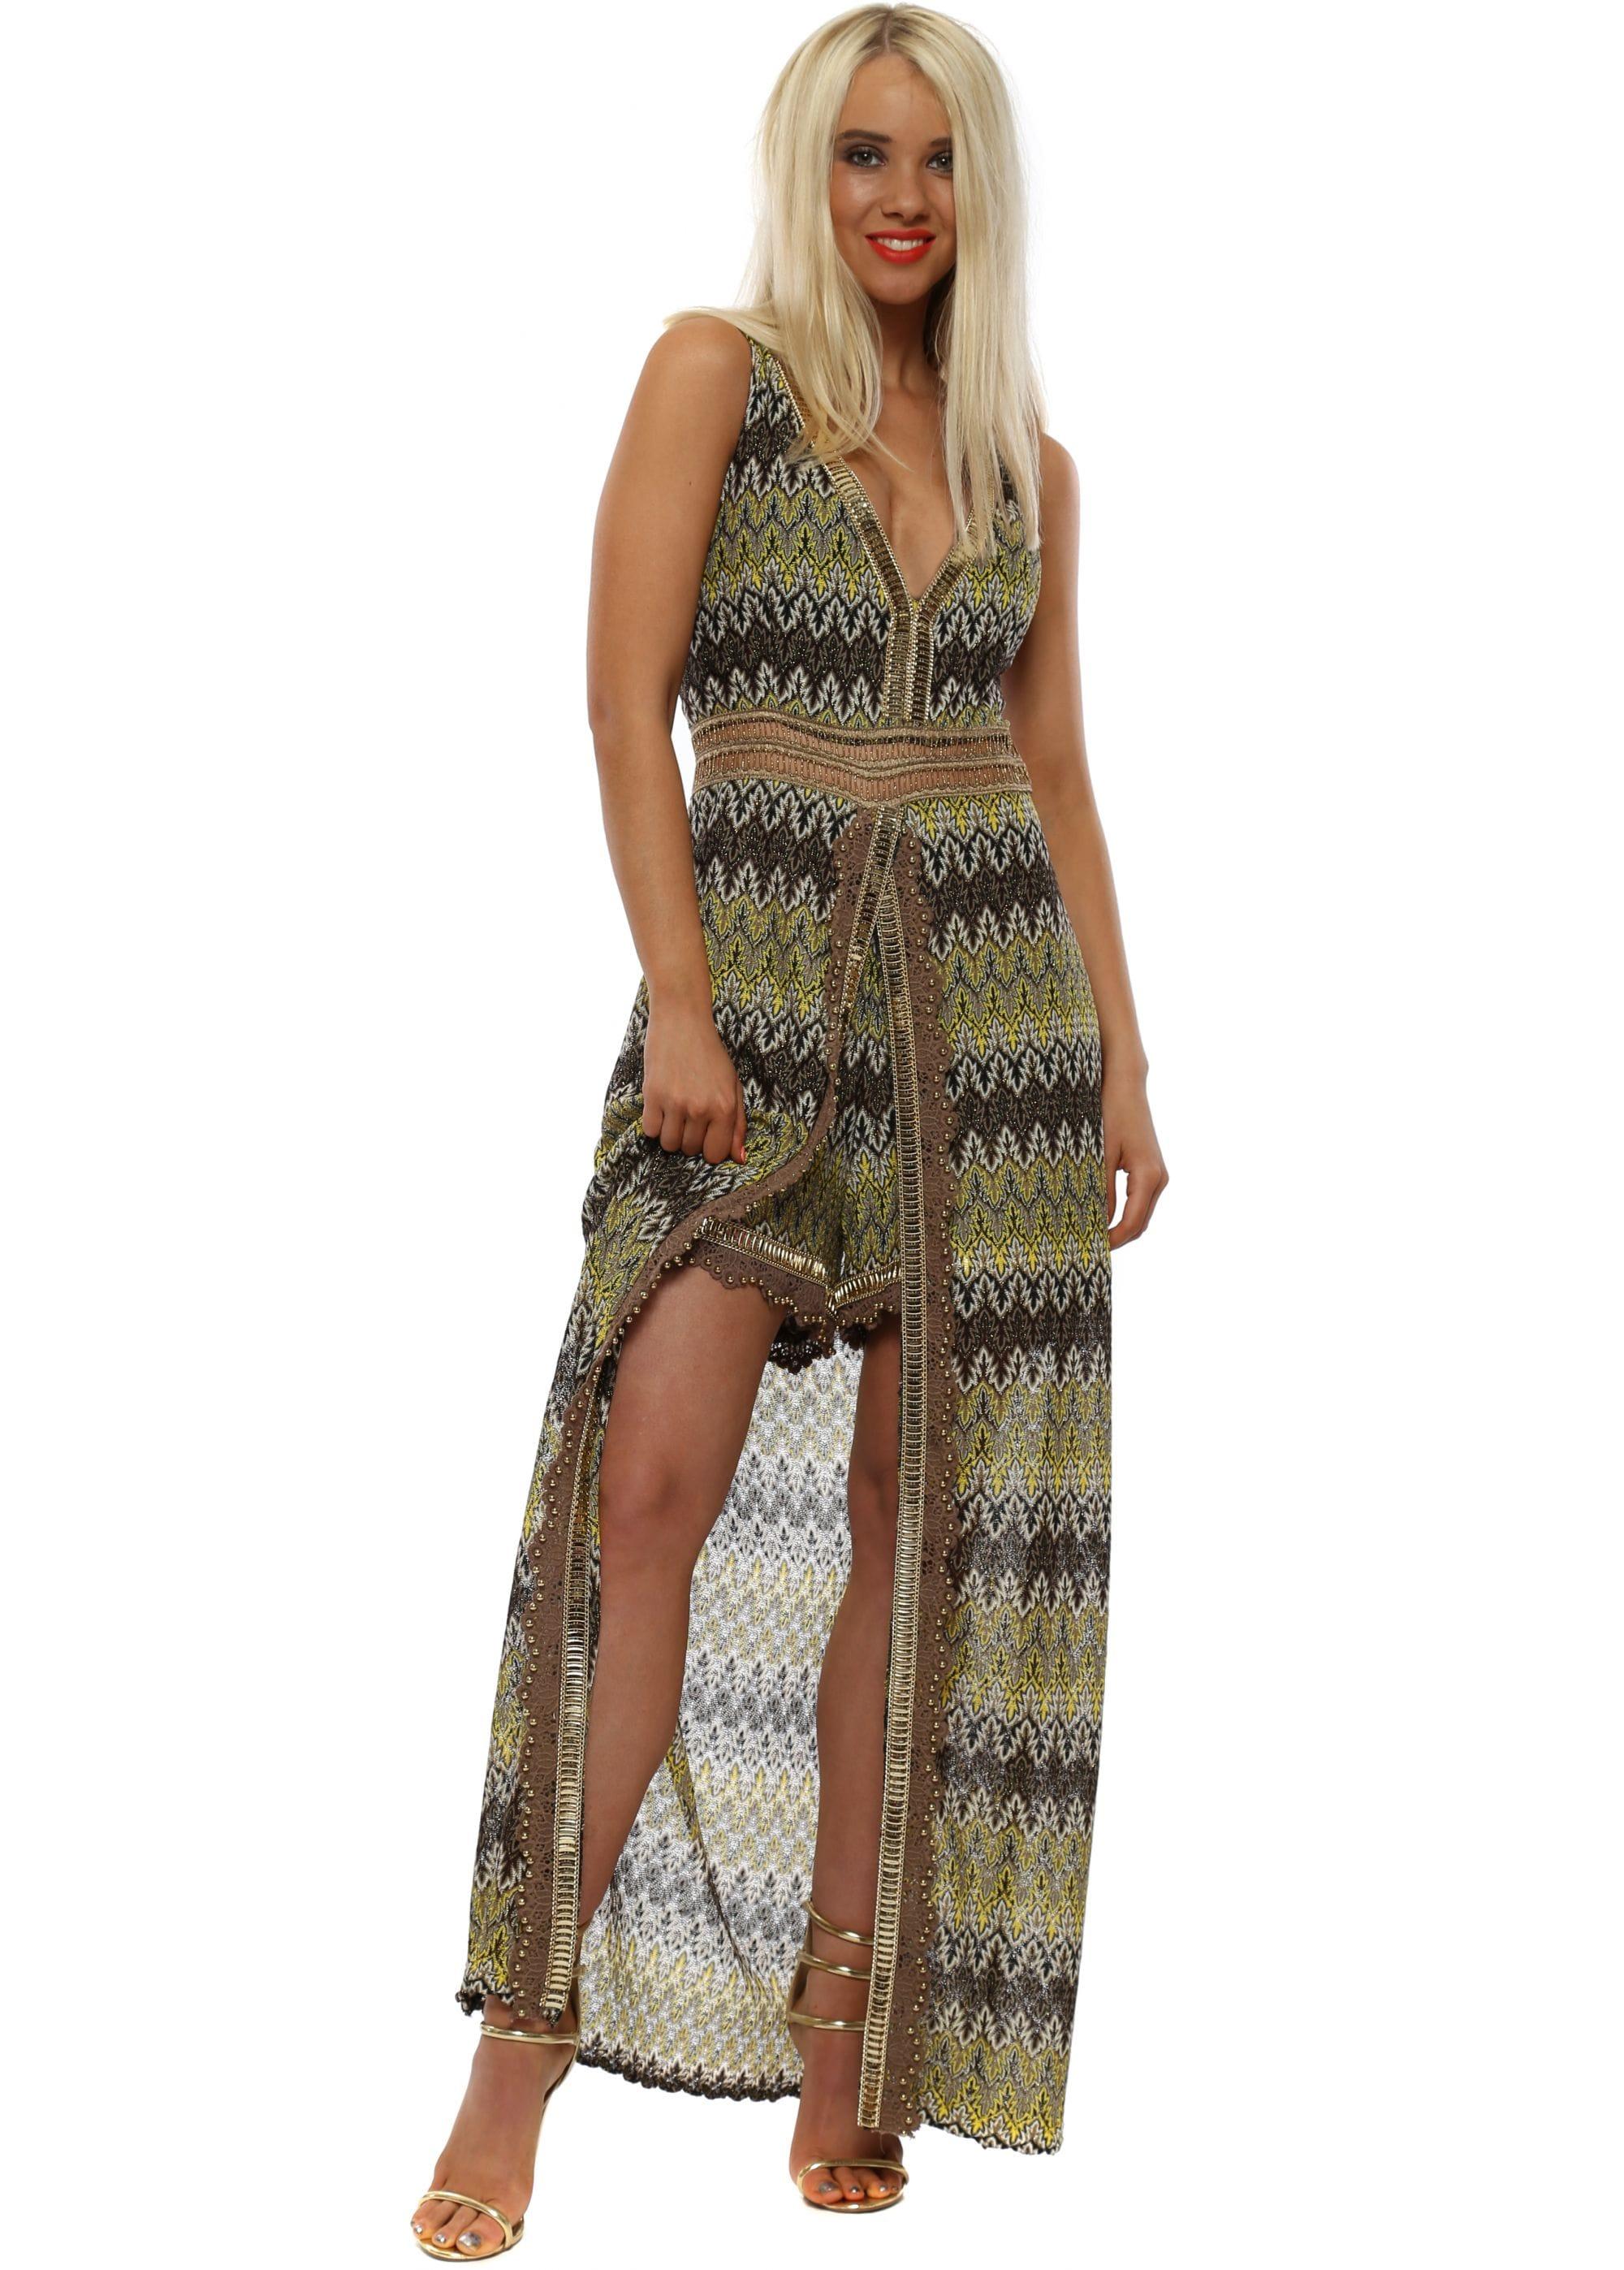 ad4ba1e03e Yellow Missi Print Maxi Dress With Shorts